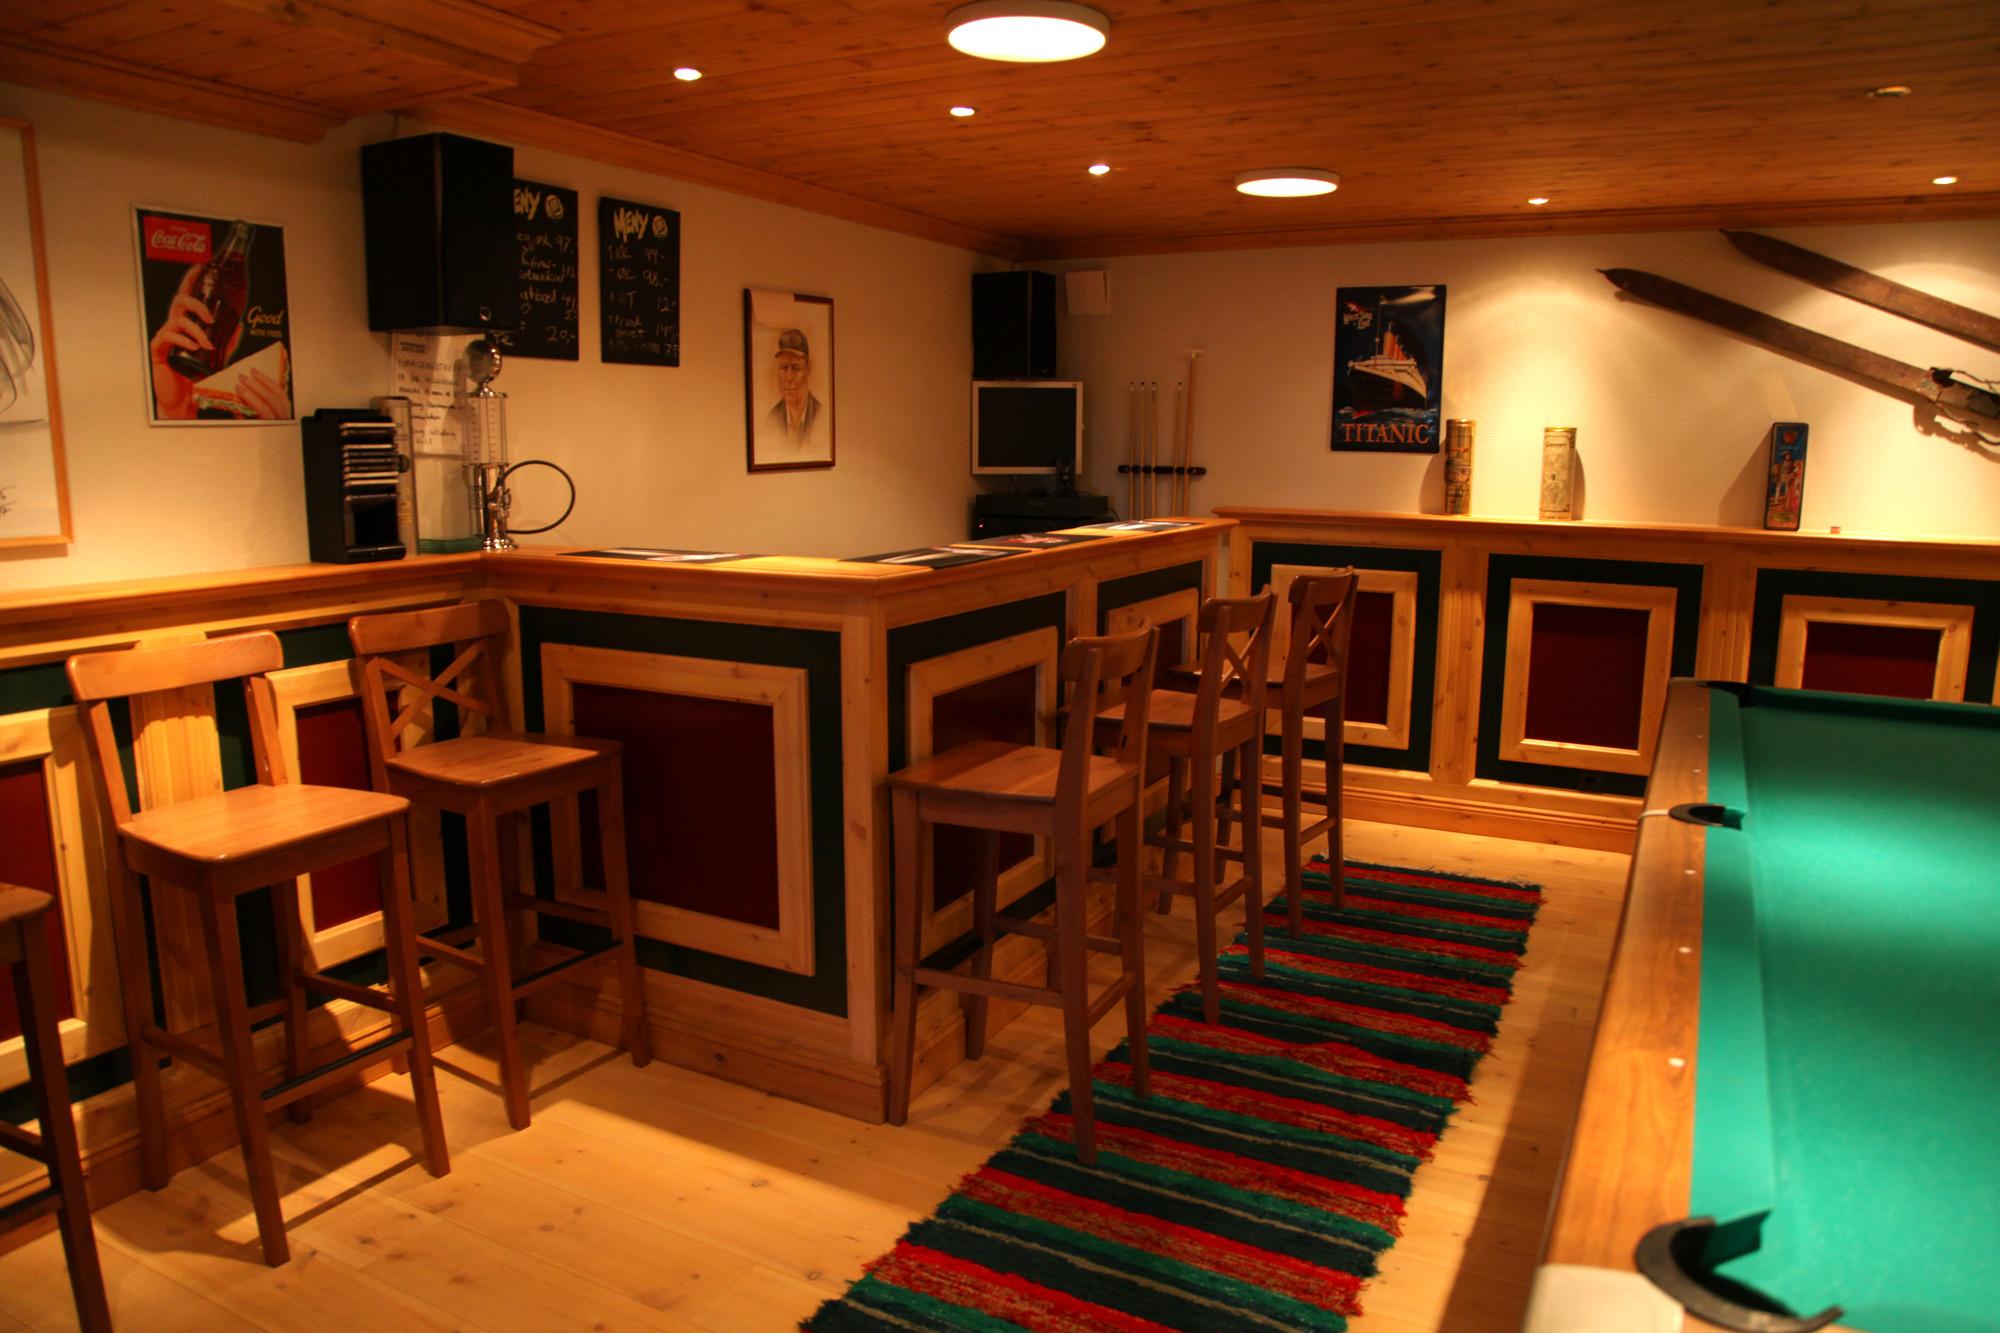 Østby Interiørverksted - din møbelsnekker i Akershus